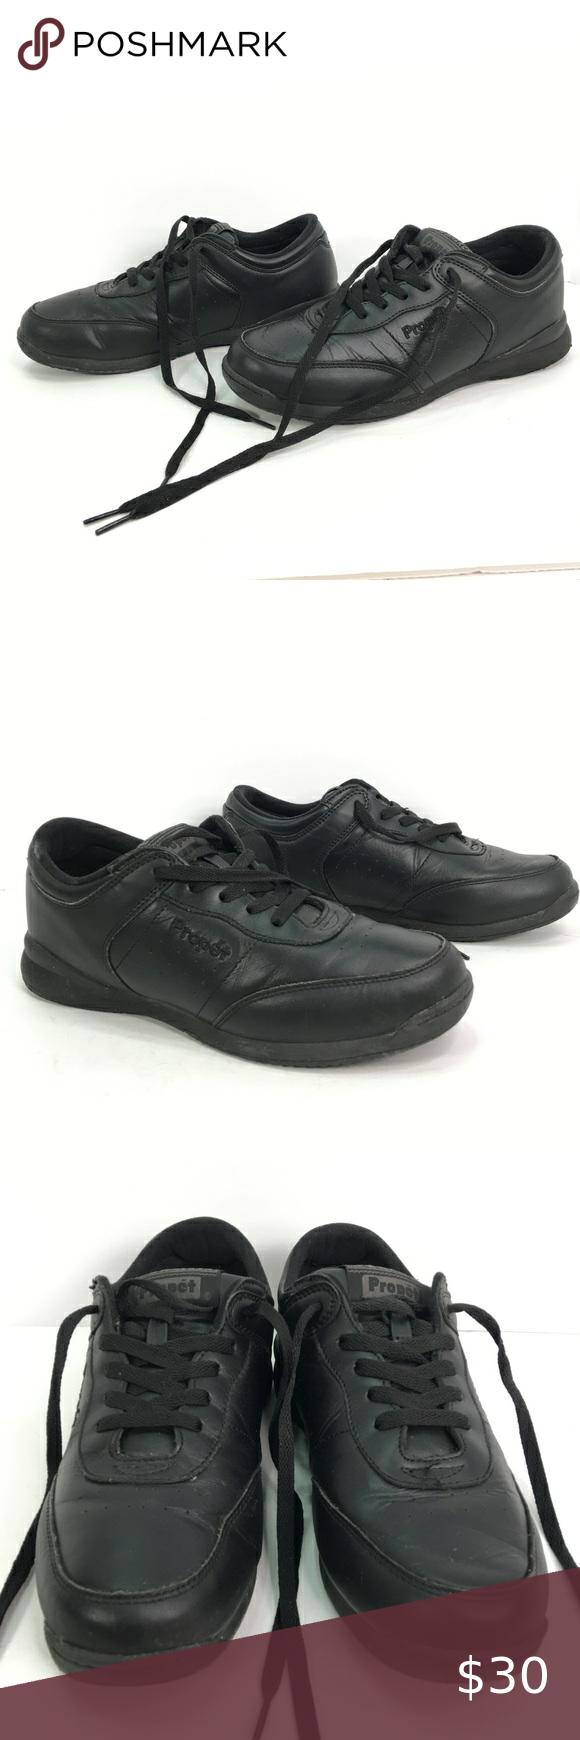 Propet 9 5 W Life Walker Black Leather Propet 9 5 W Life Walker Black Leather There Is Wear Of The Tread O Black Leather Dress Shoes Men Womens Shoes Sneakers [ 1740 x 580 Pixel ]